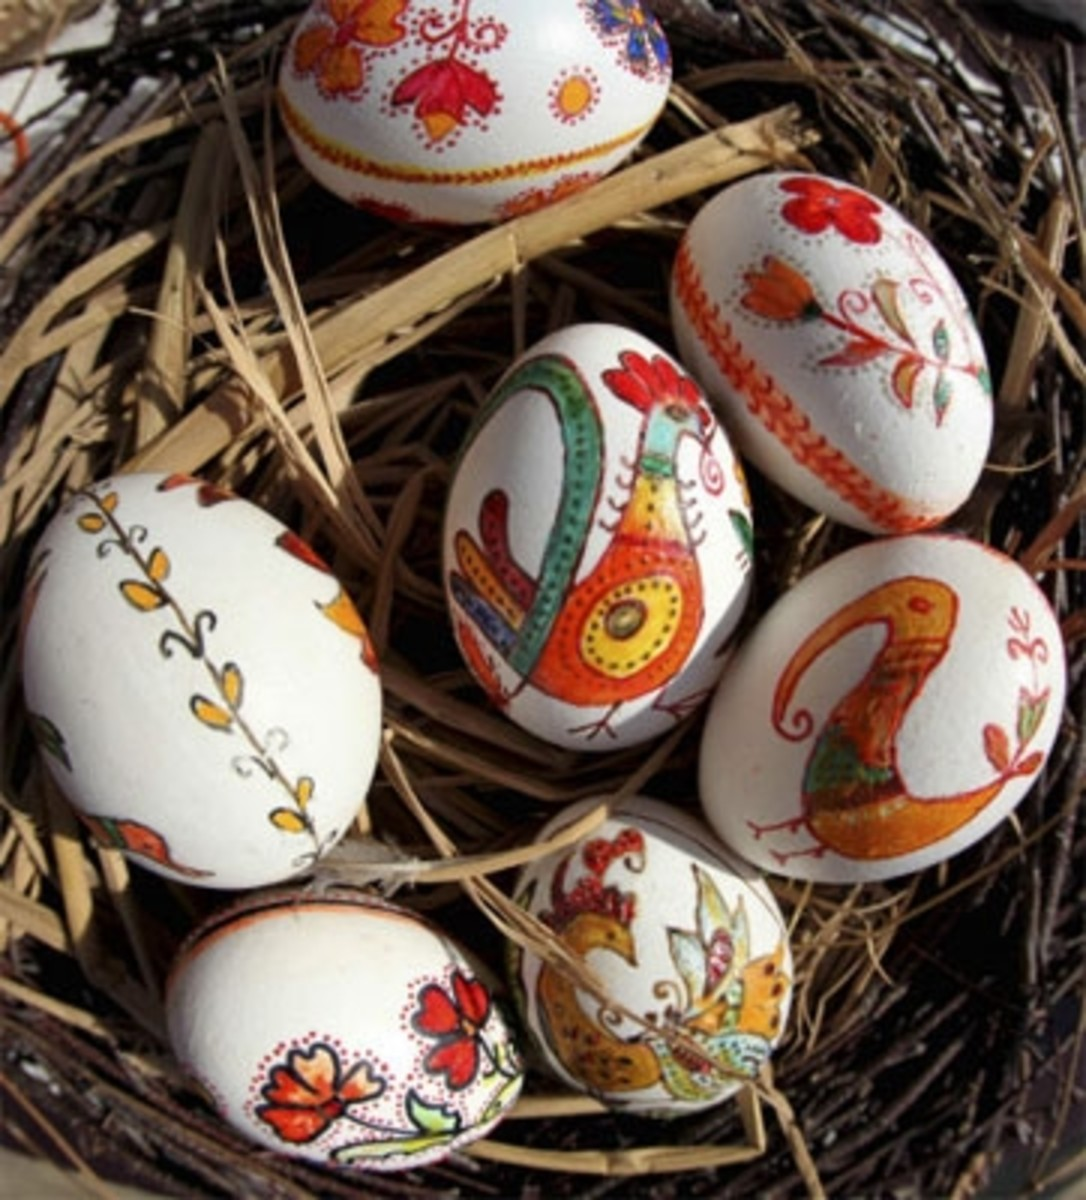 easter eggs in Sofia Bulgaria